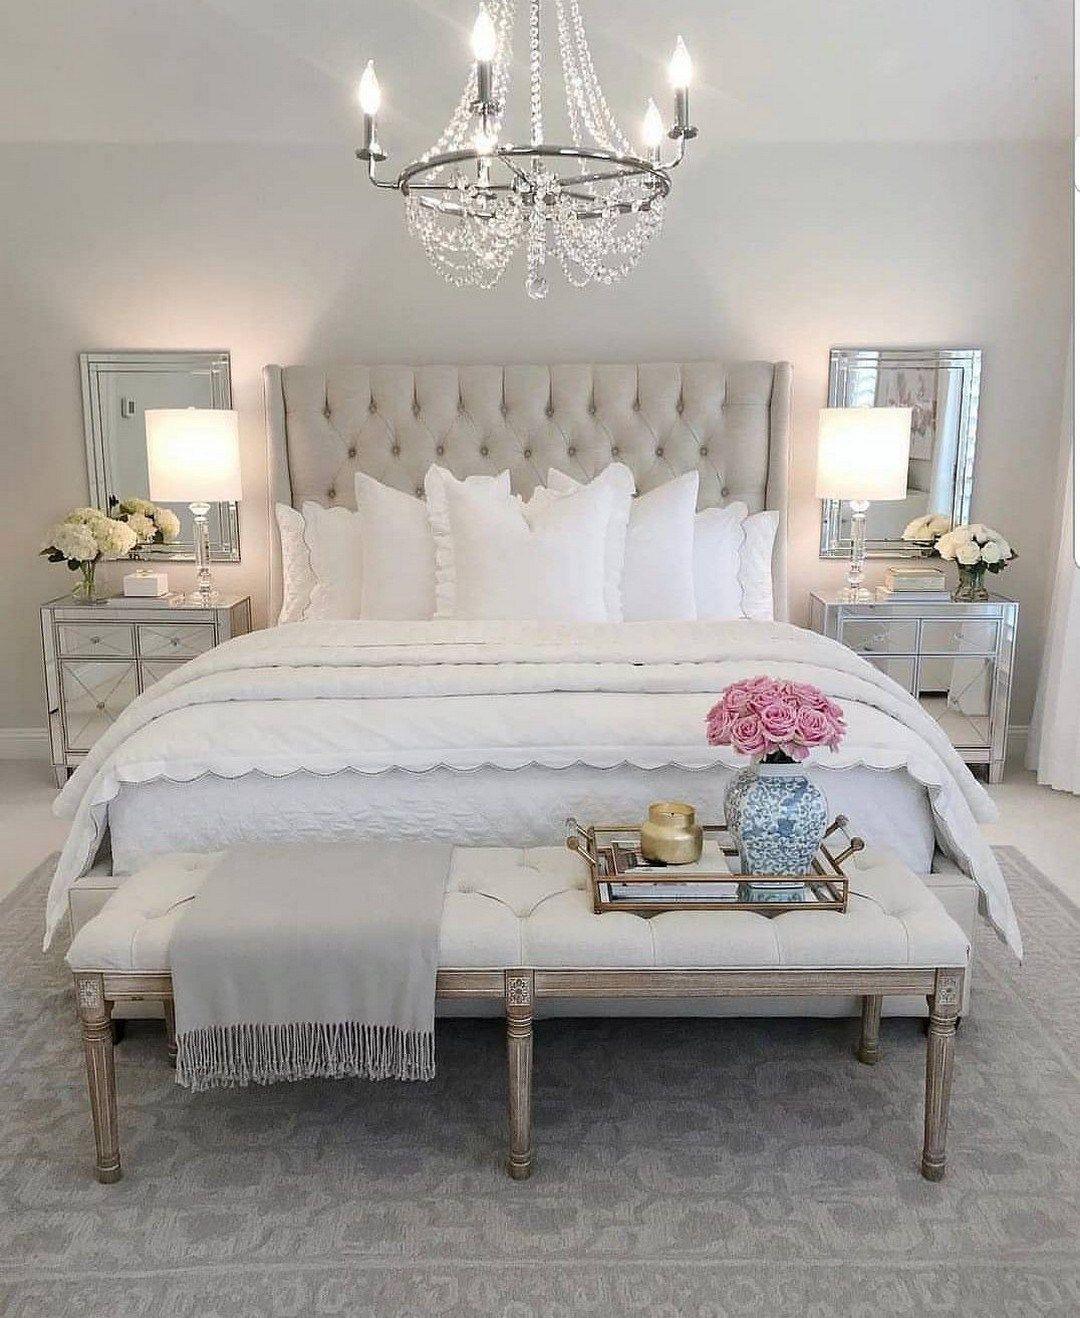 Hugedomains Com Master Bedrooms Decor Home Decor Bedroom Glam Bedroom Decor